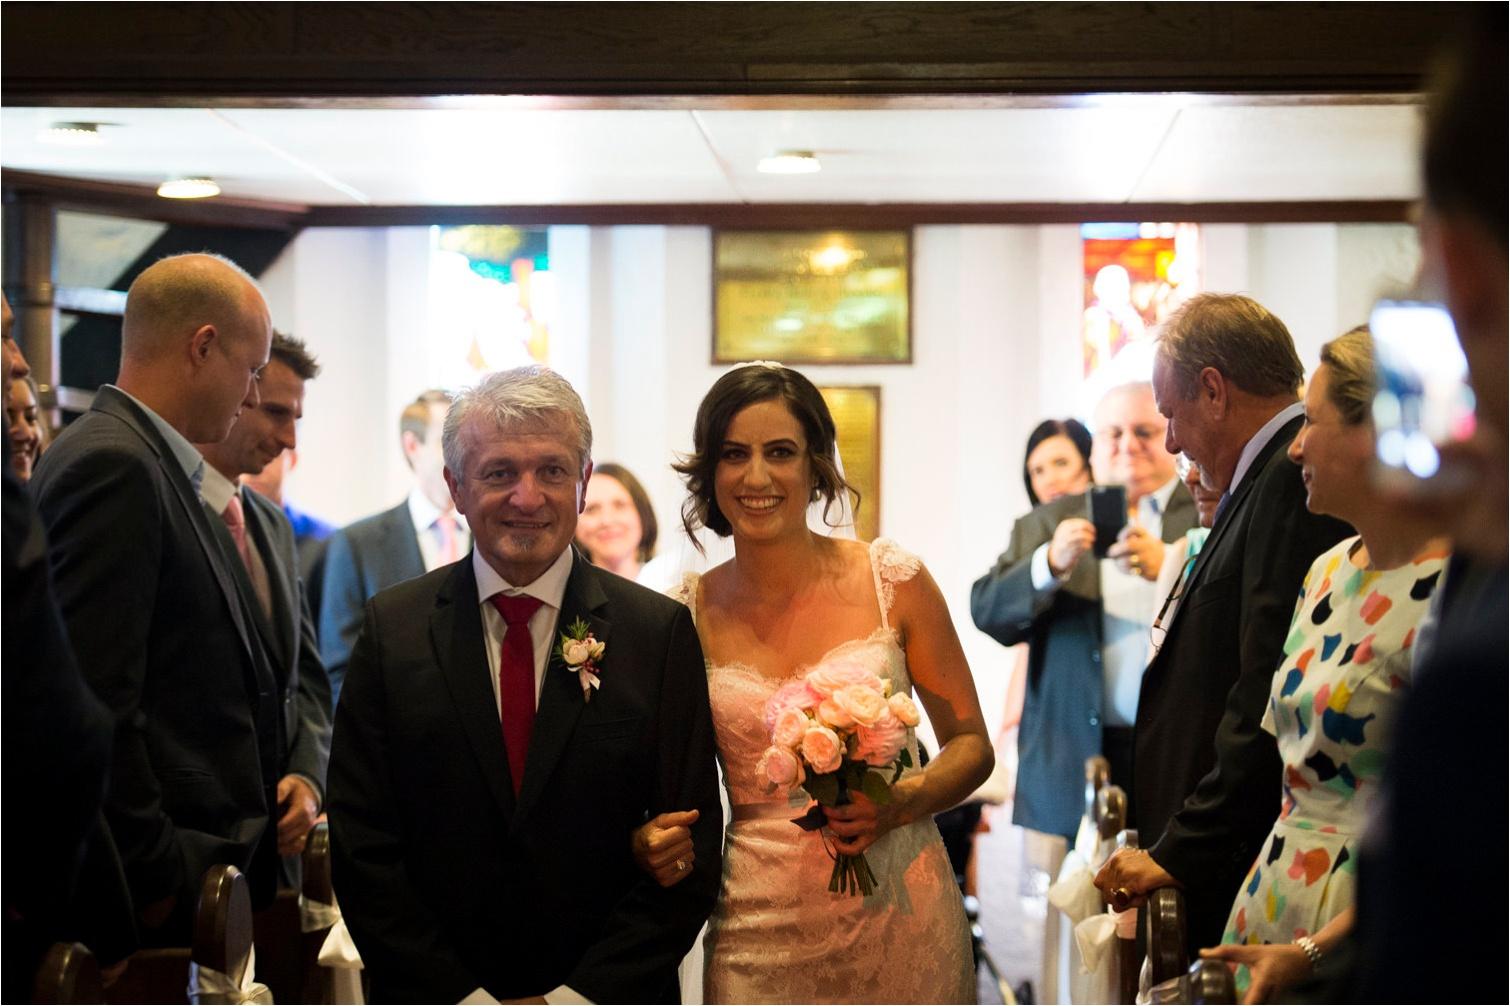 Nicole&Carlie_Watsons_Bay_Hotel_Wedding_by_Gold_Coast_Photographers-The_Follans13.jpg